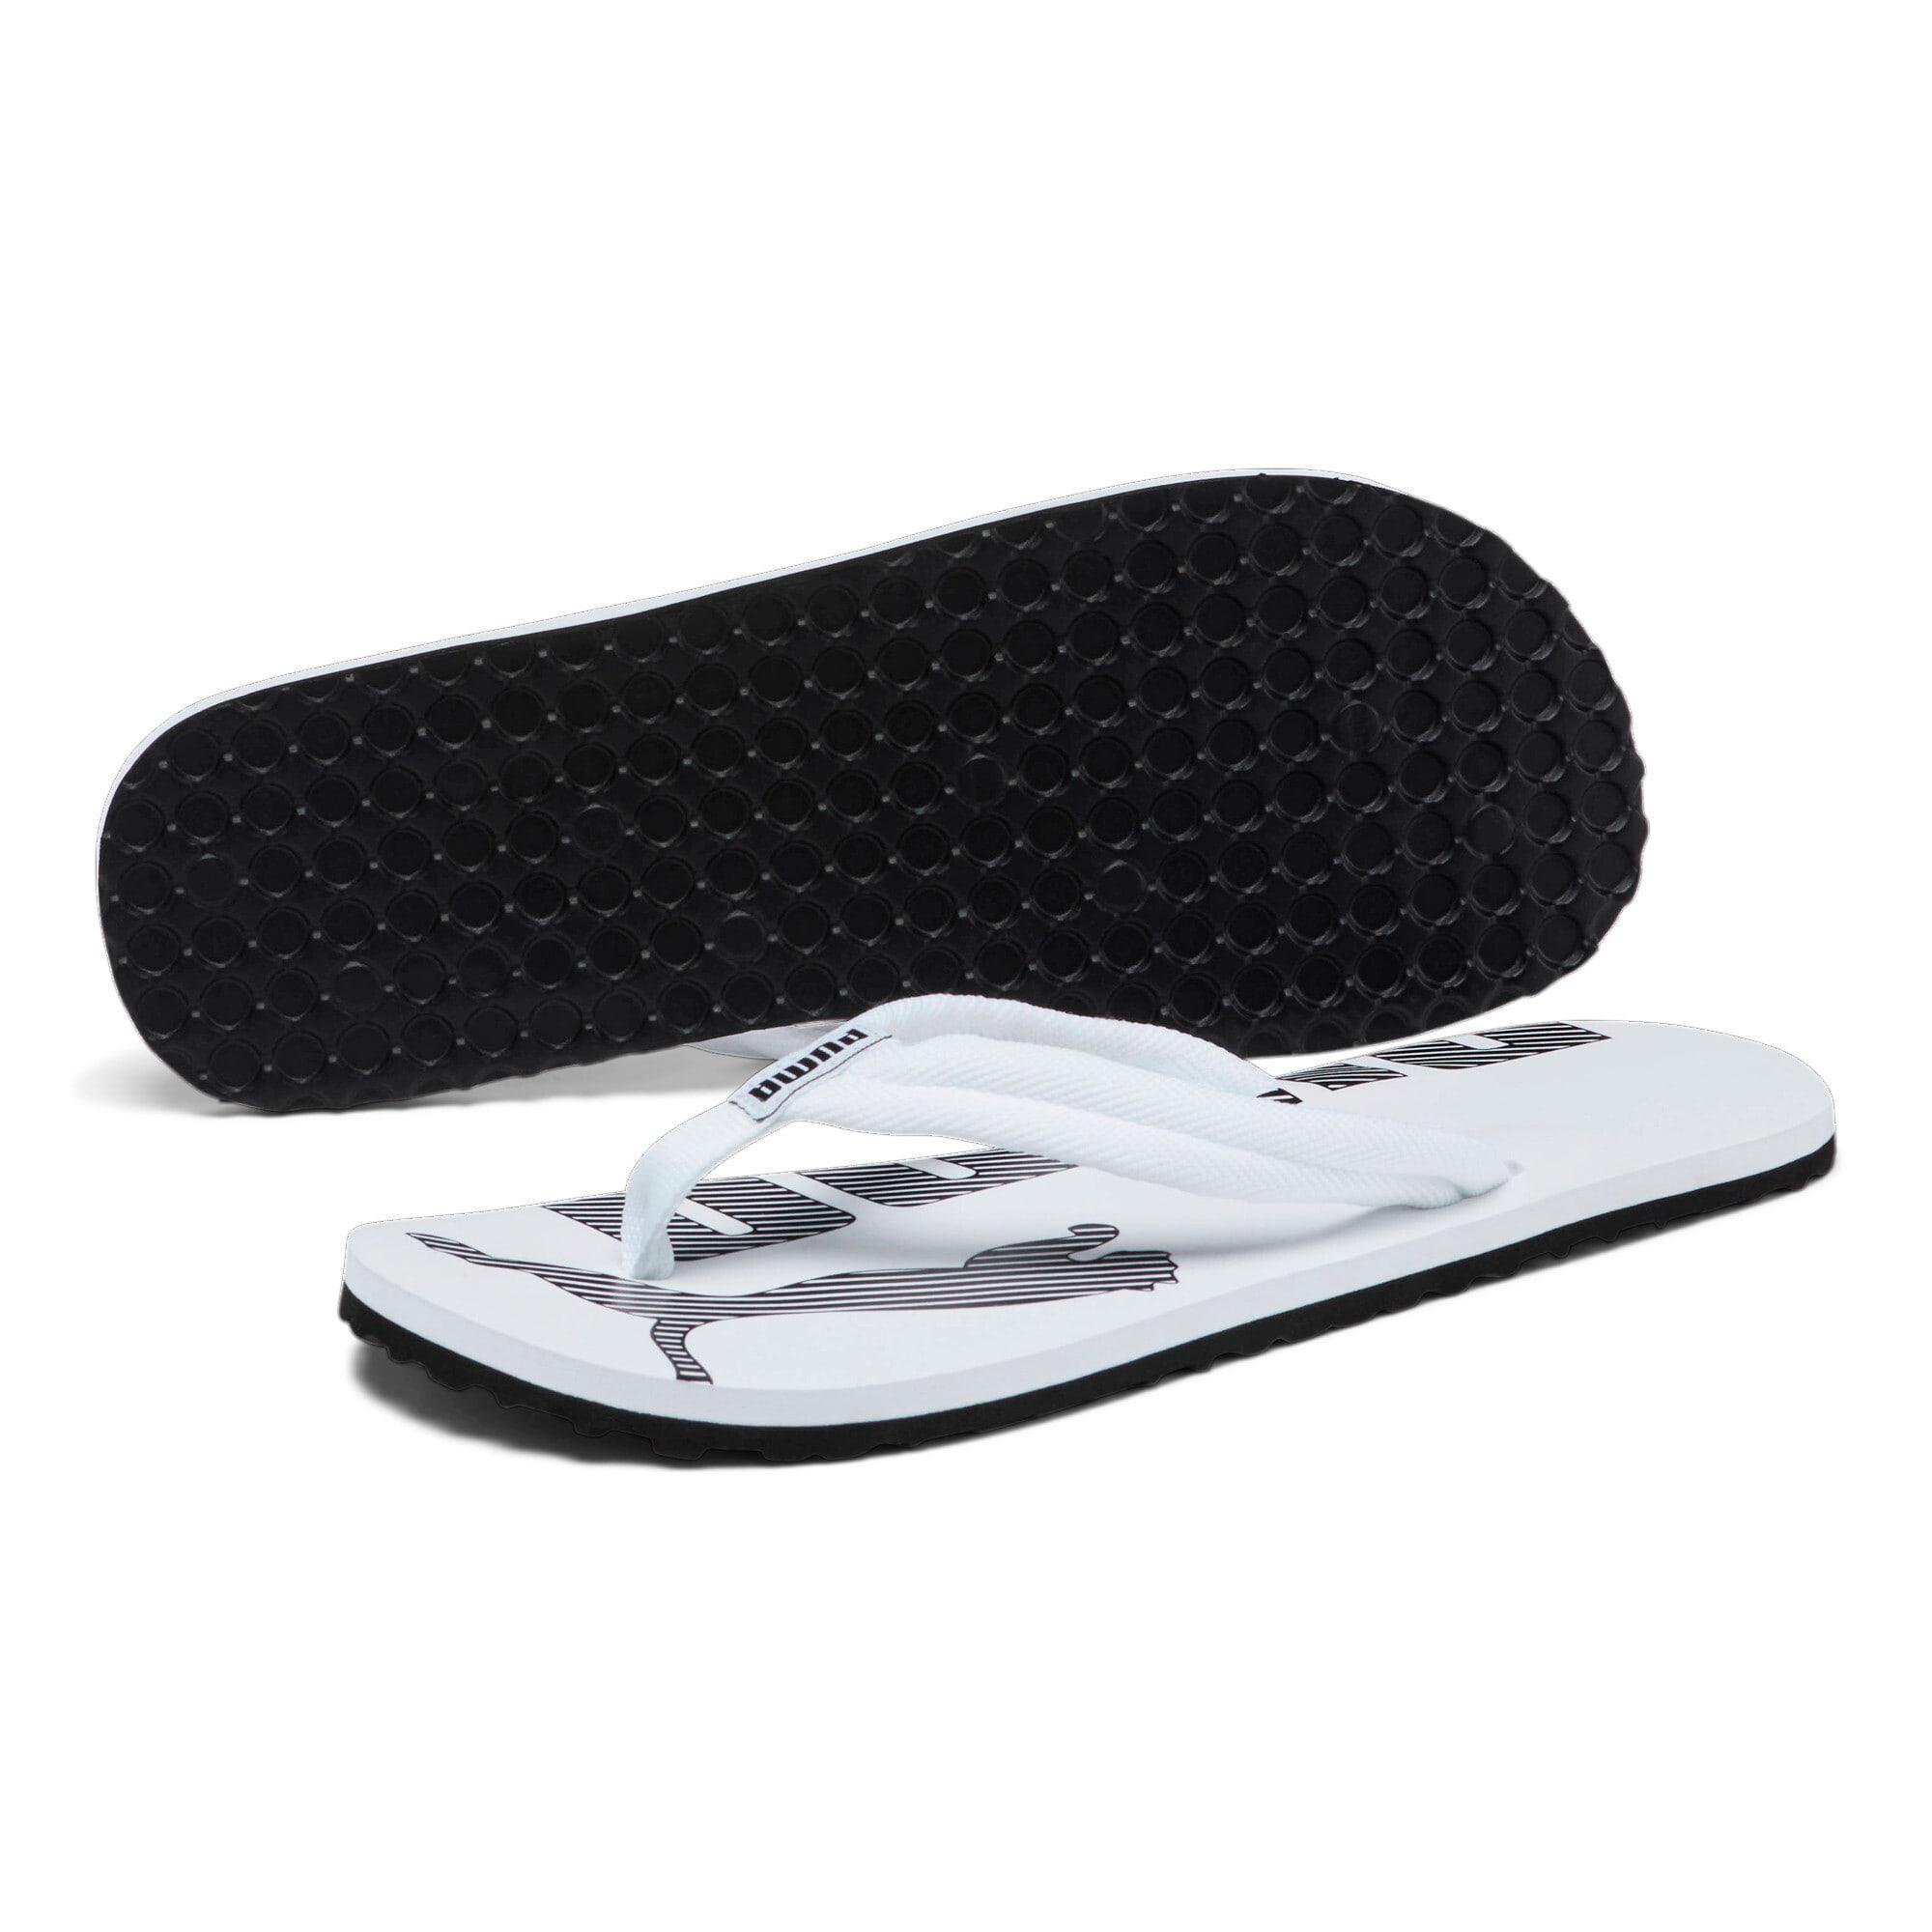 Thumbnail 2 of Epic Flip v2 Sandals, white-black, medium